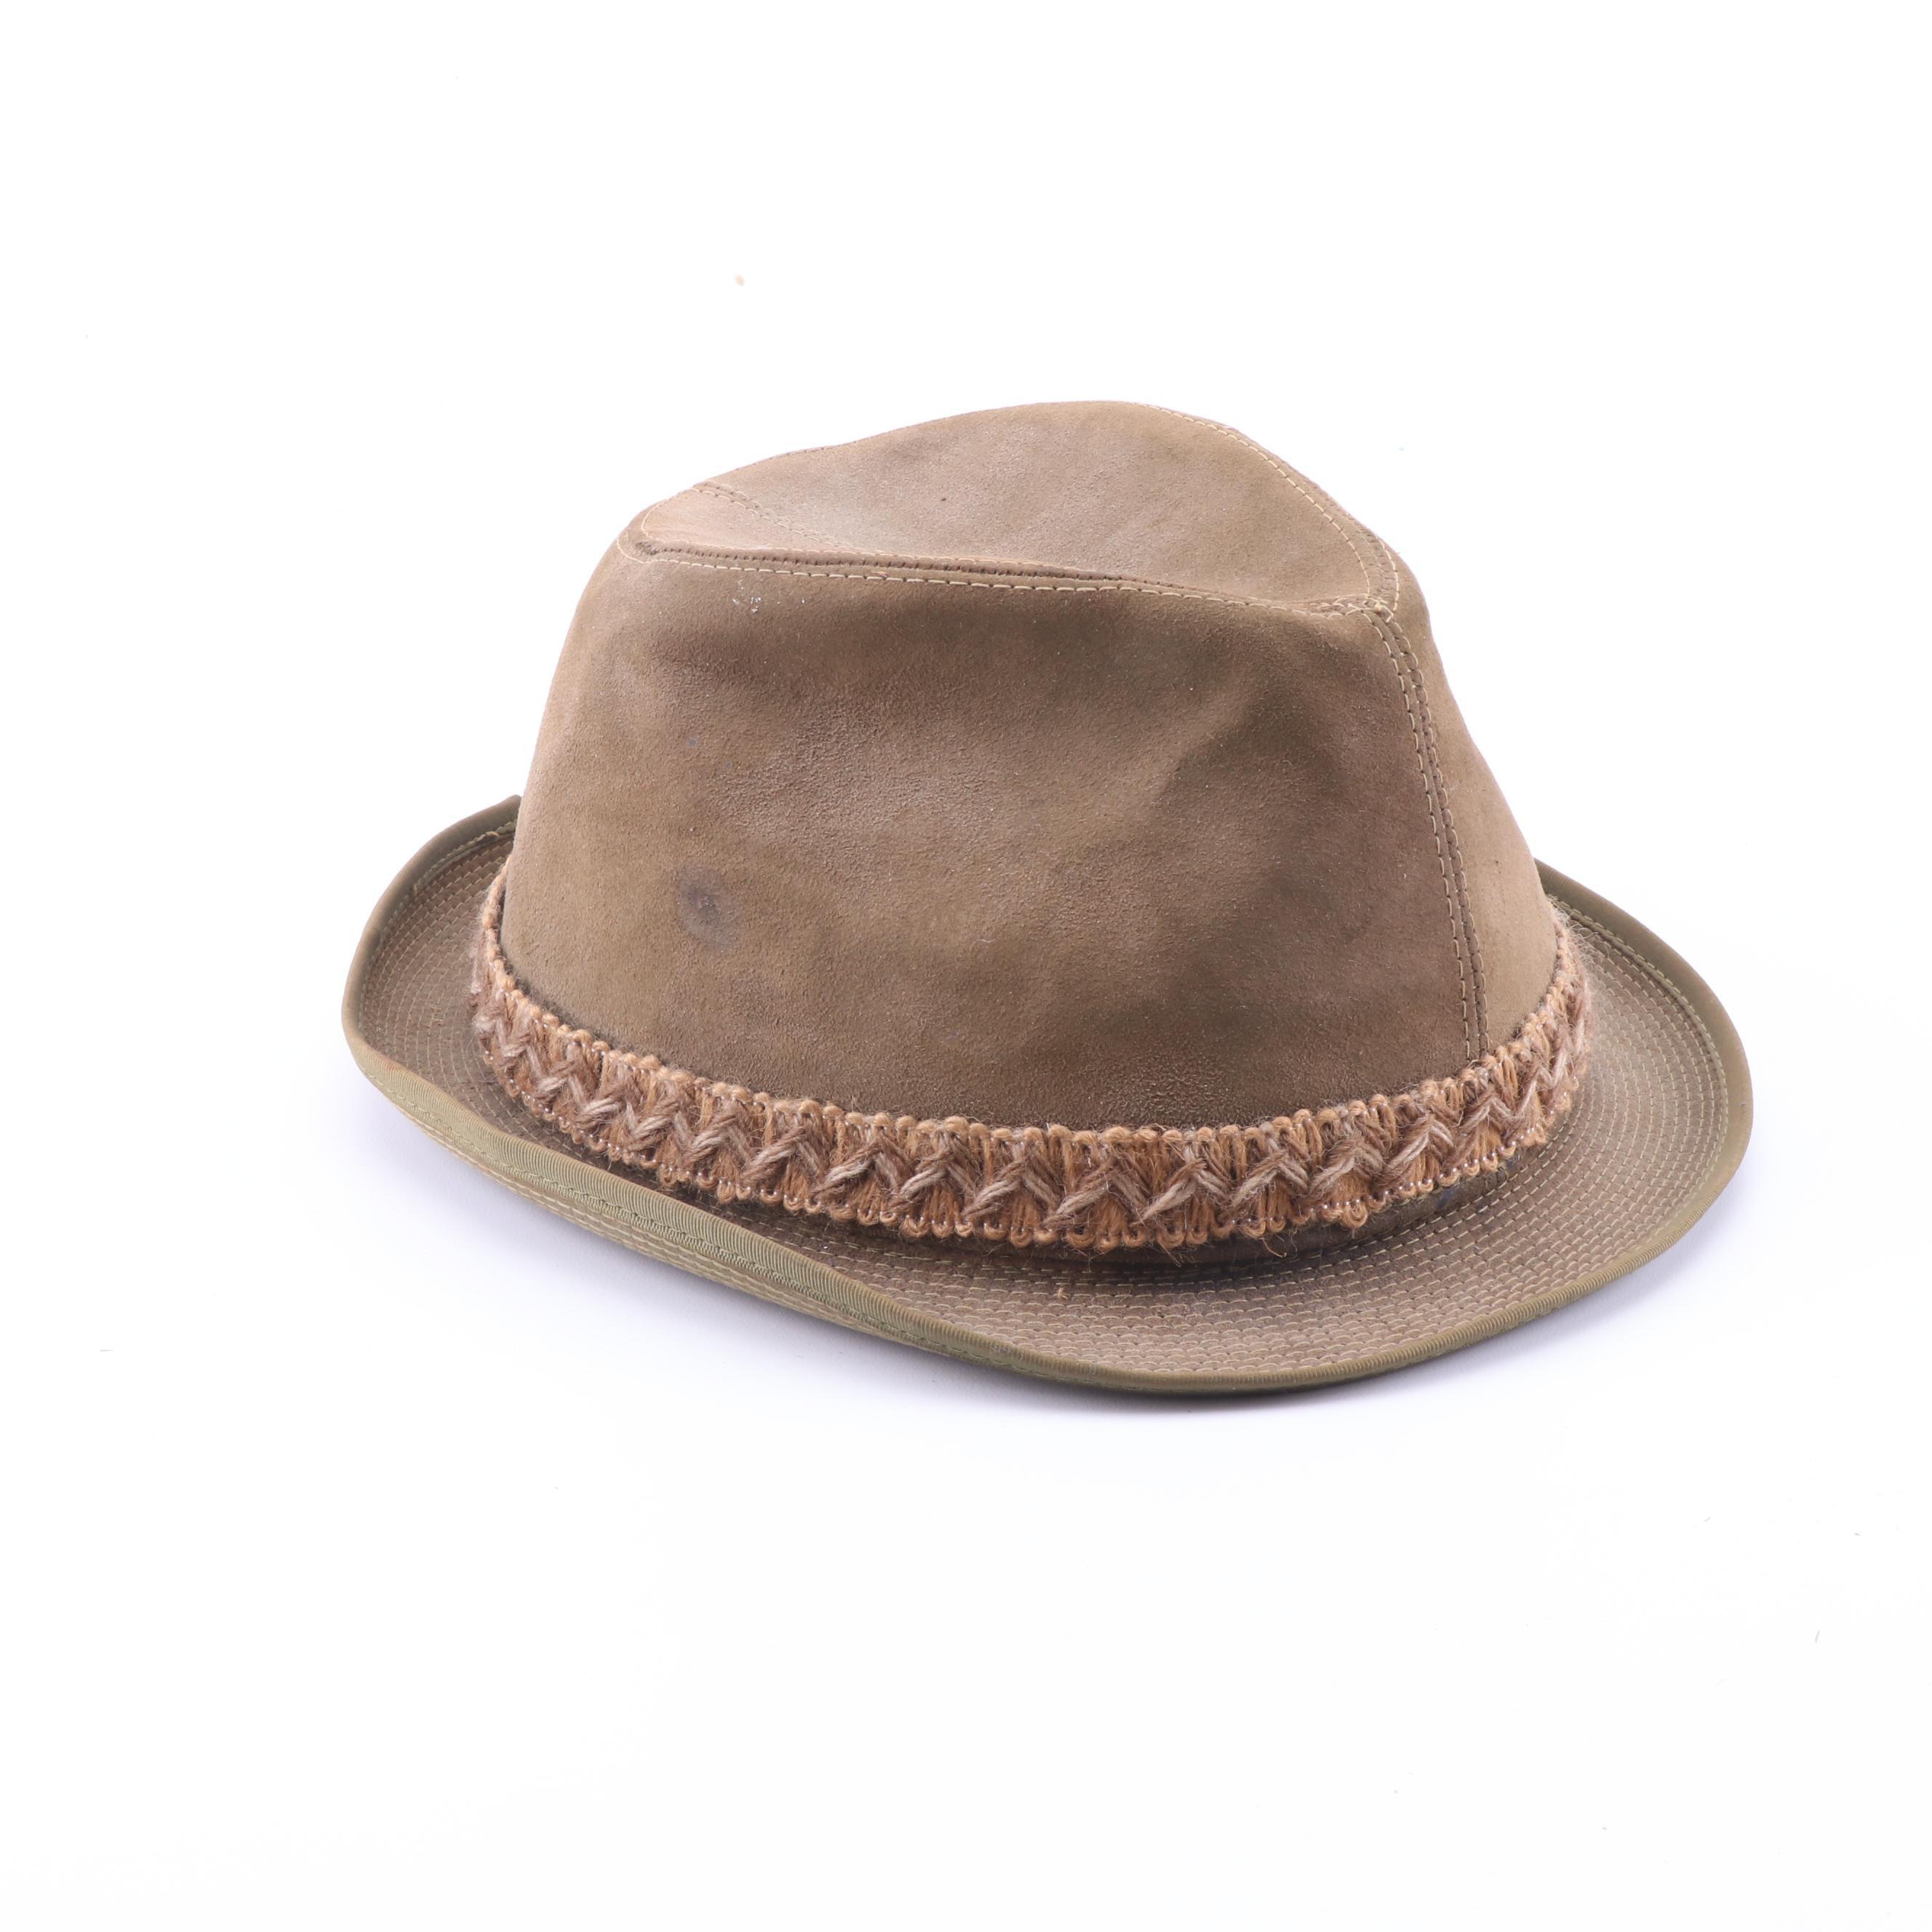 Men's Vintage Stetson Beige Suede Trilby Hat